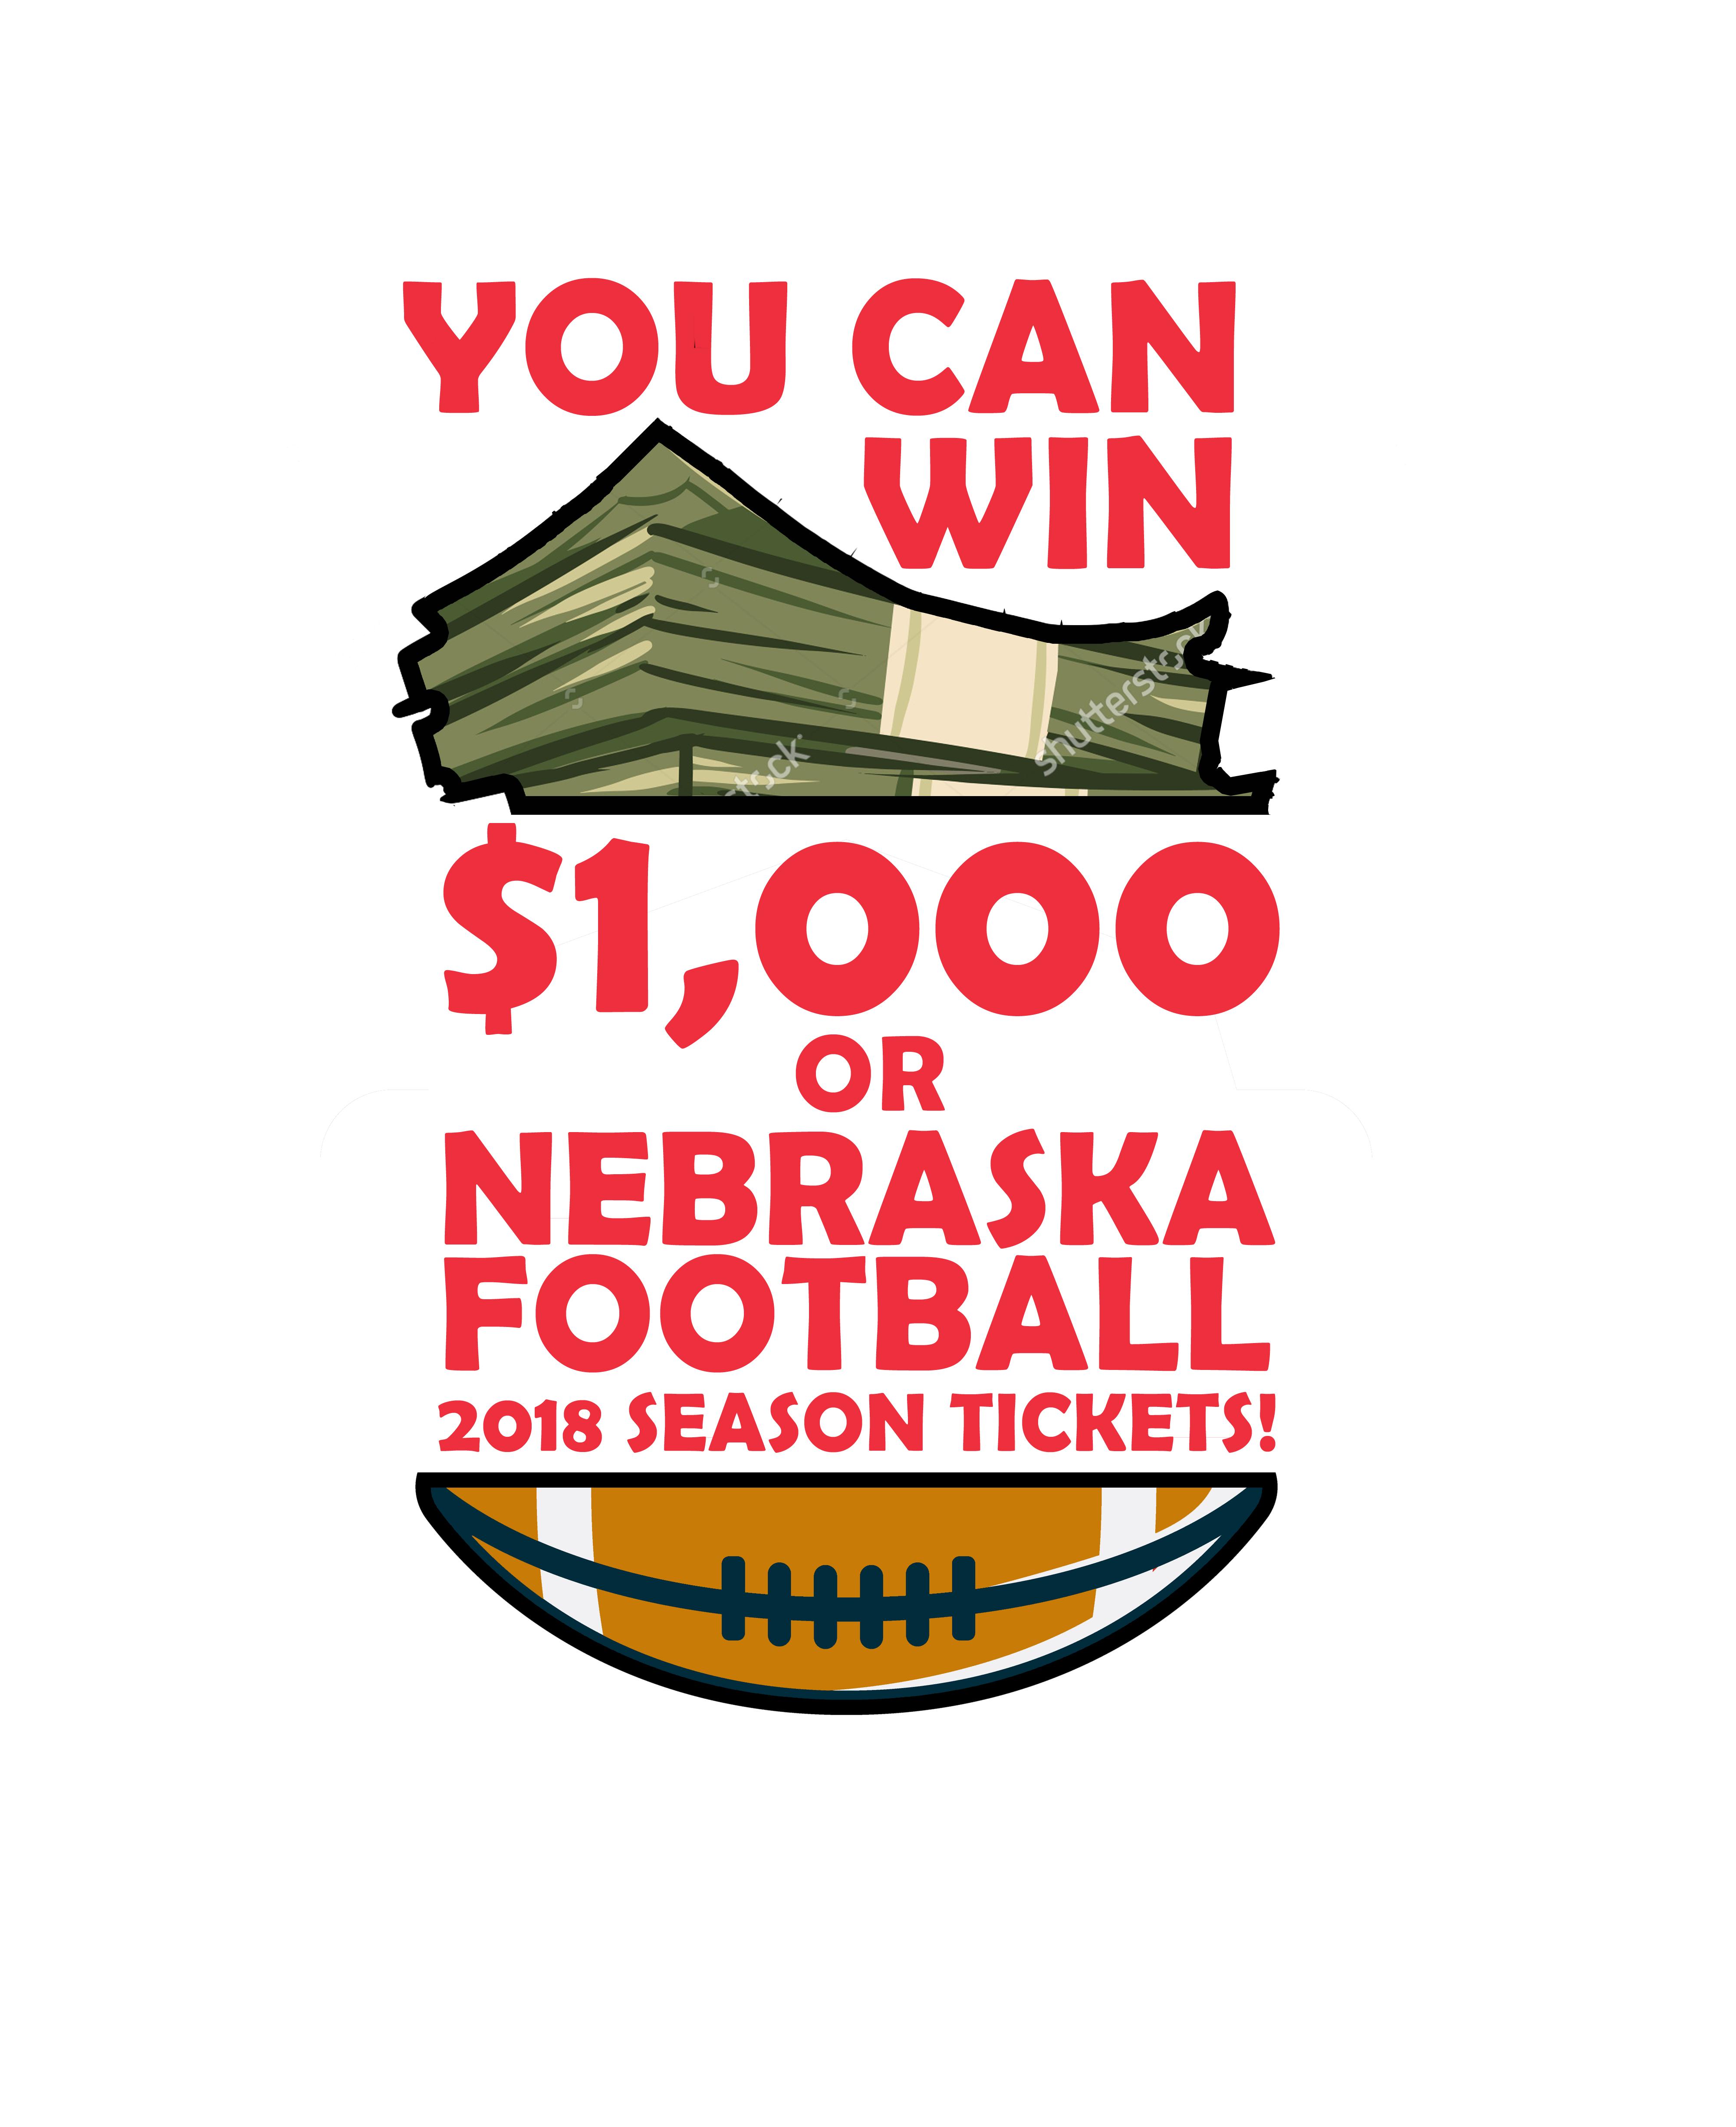 Win $1,000 or a pair of 2018 Nebraska football season tickets!